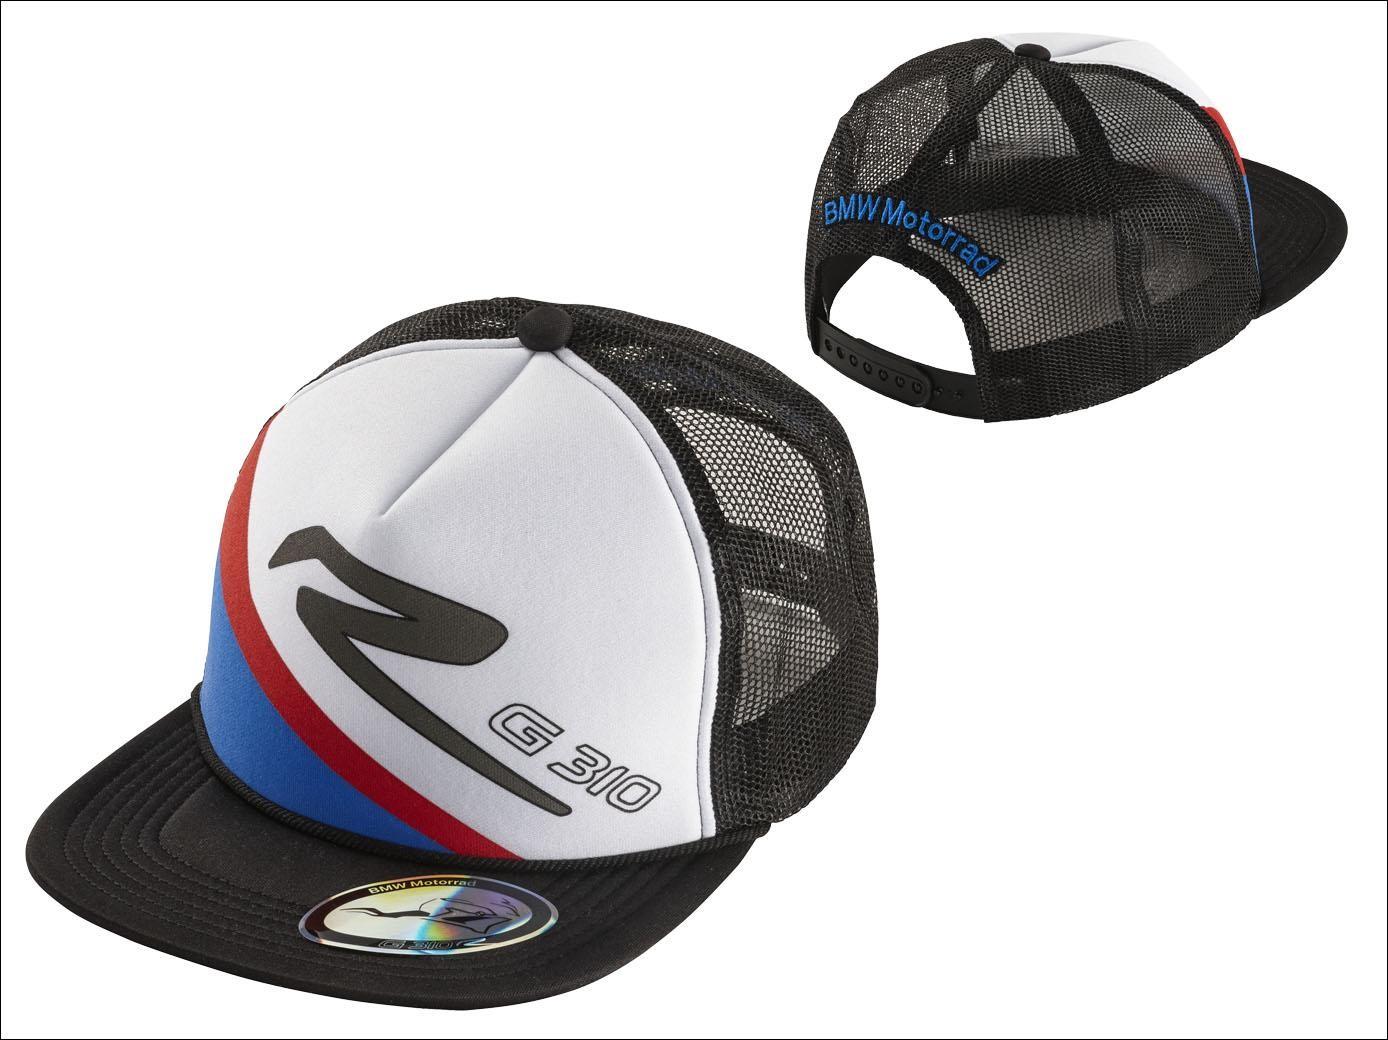 BMW Smart CC G310 Hat / Cap - 76898352739